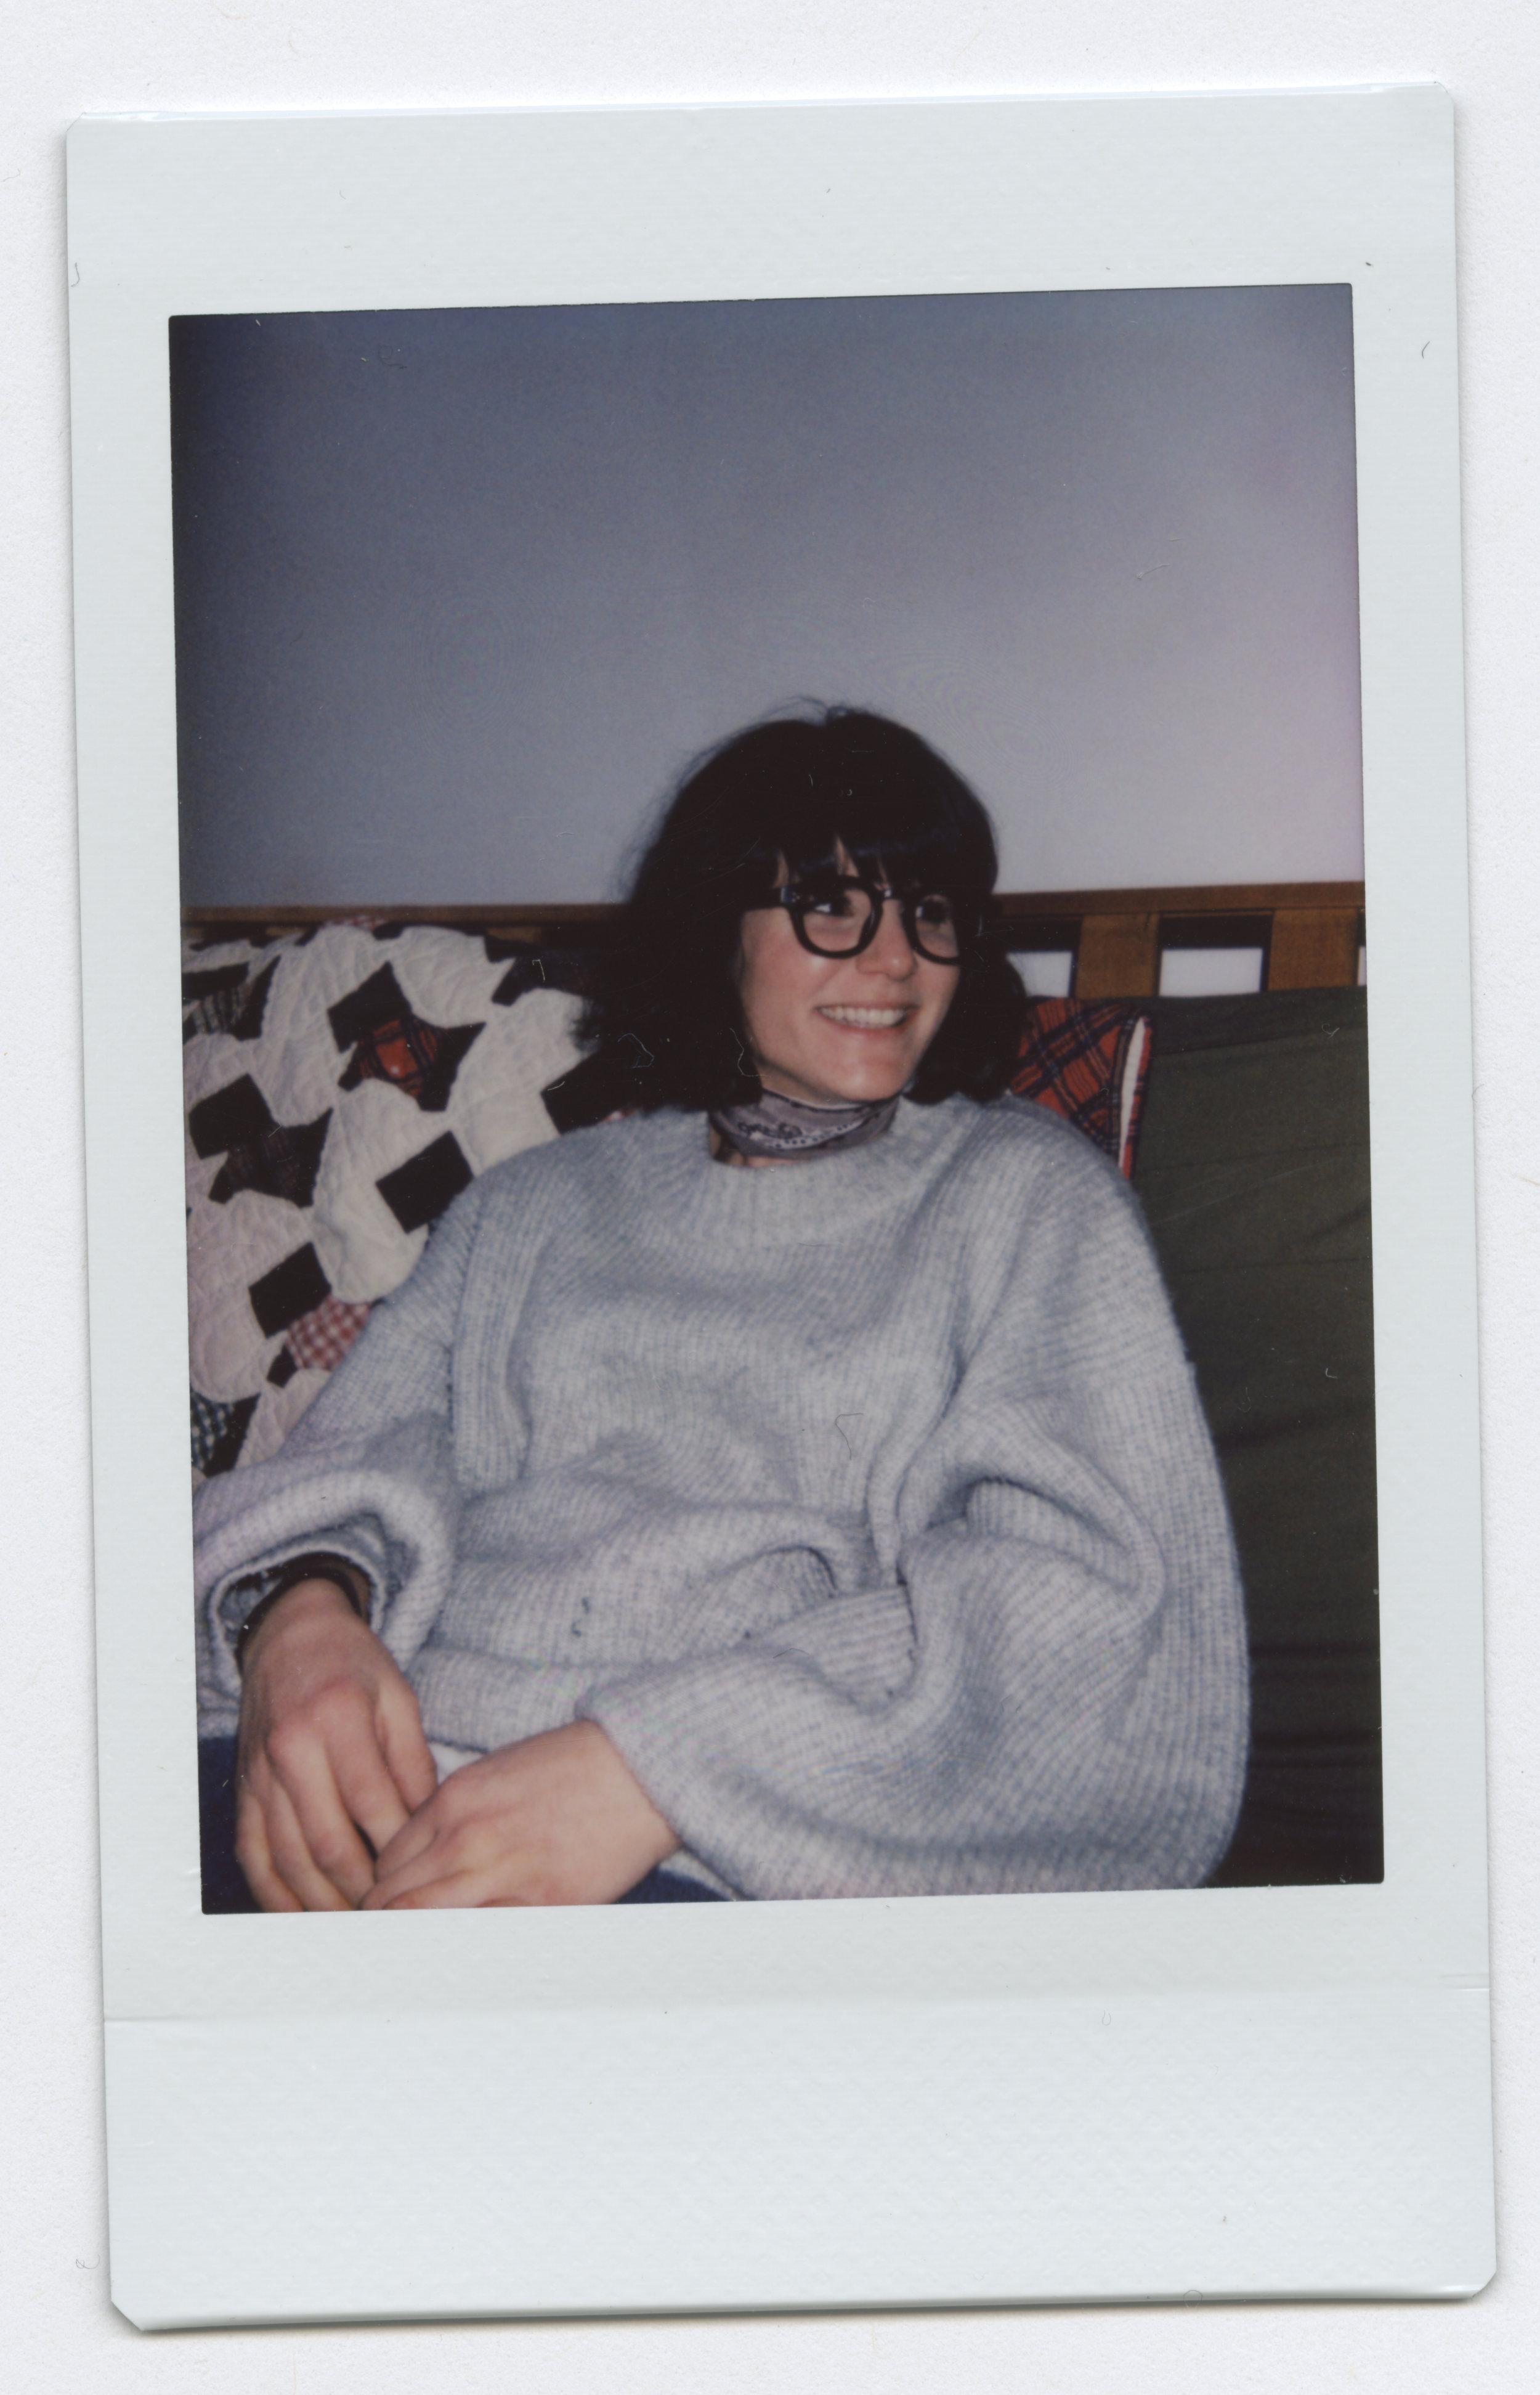 Maggie_polaroid.jpg